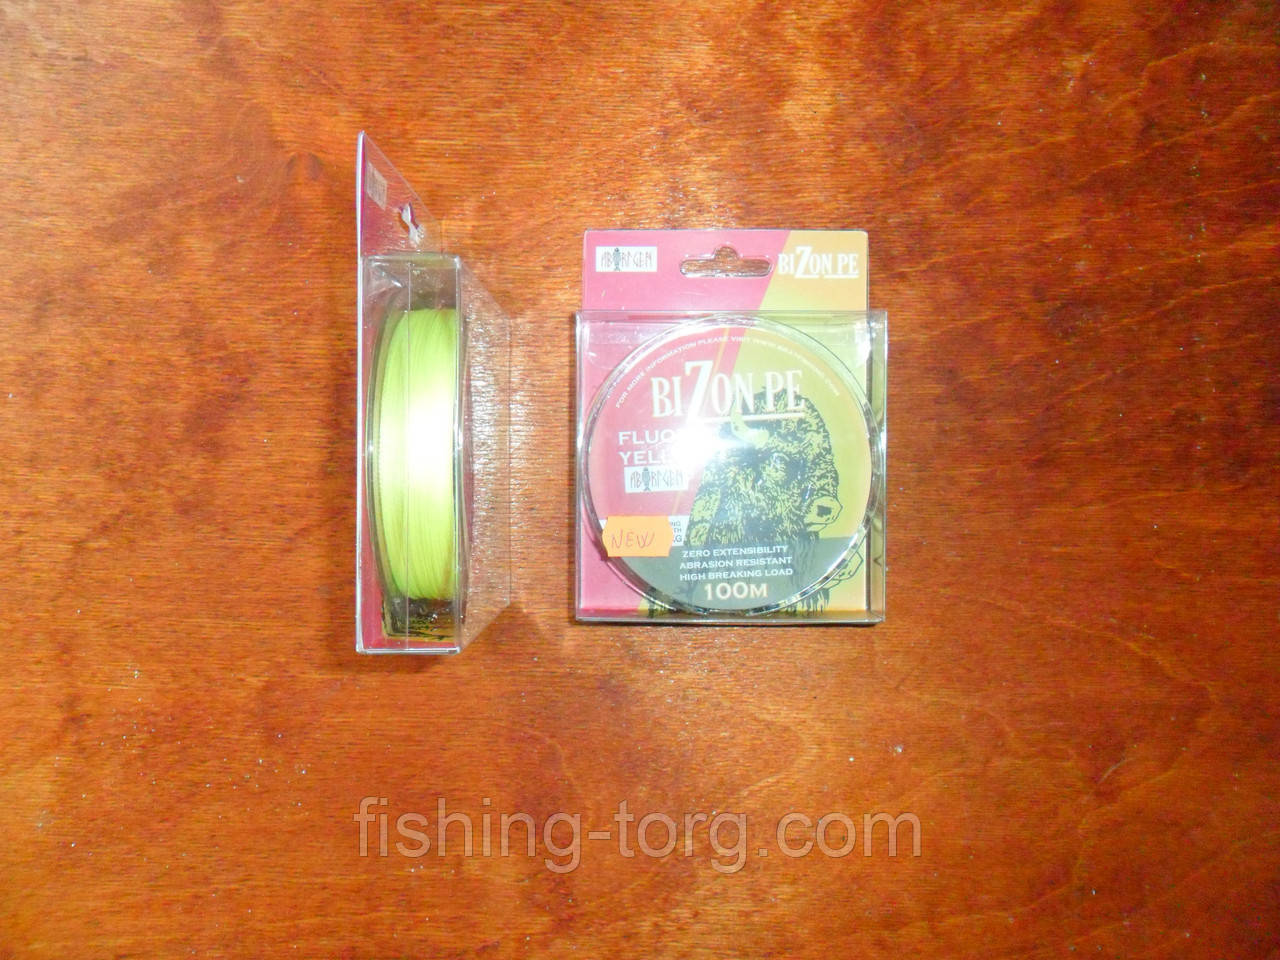 Шнур плетёный bizon pe fluoro yellow  0.24 мм